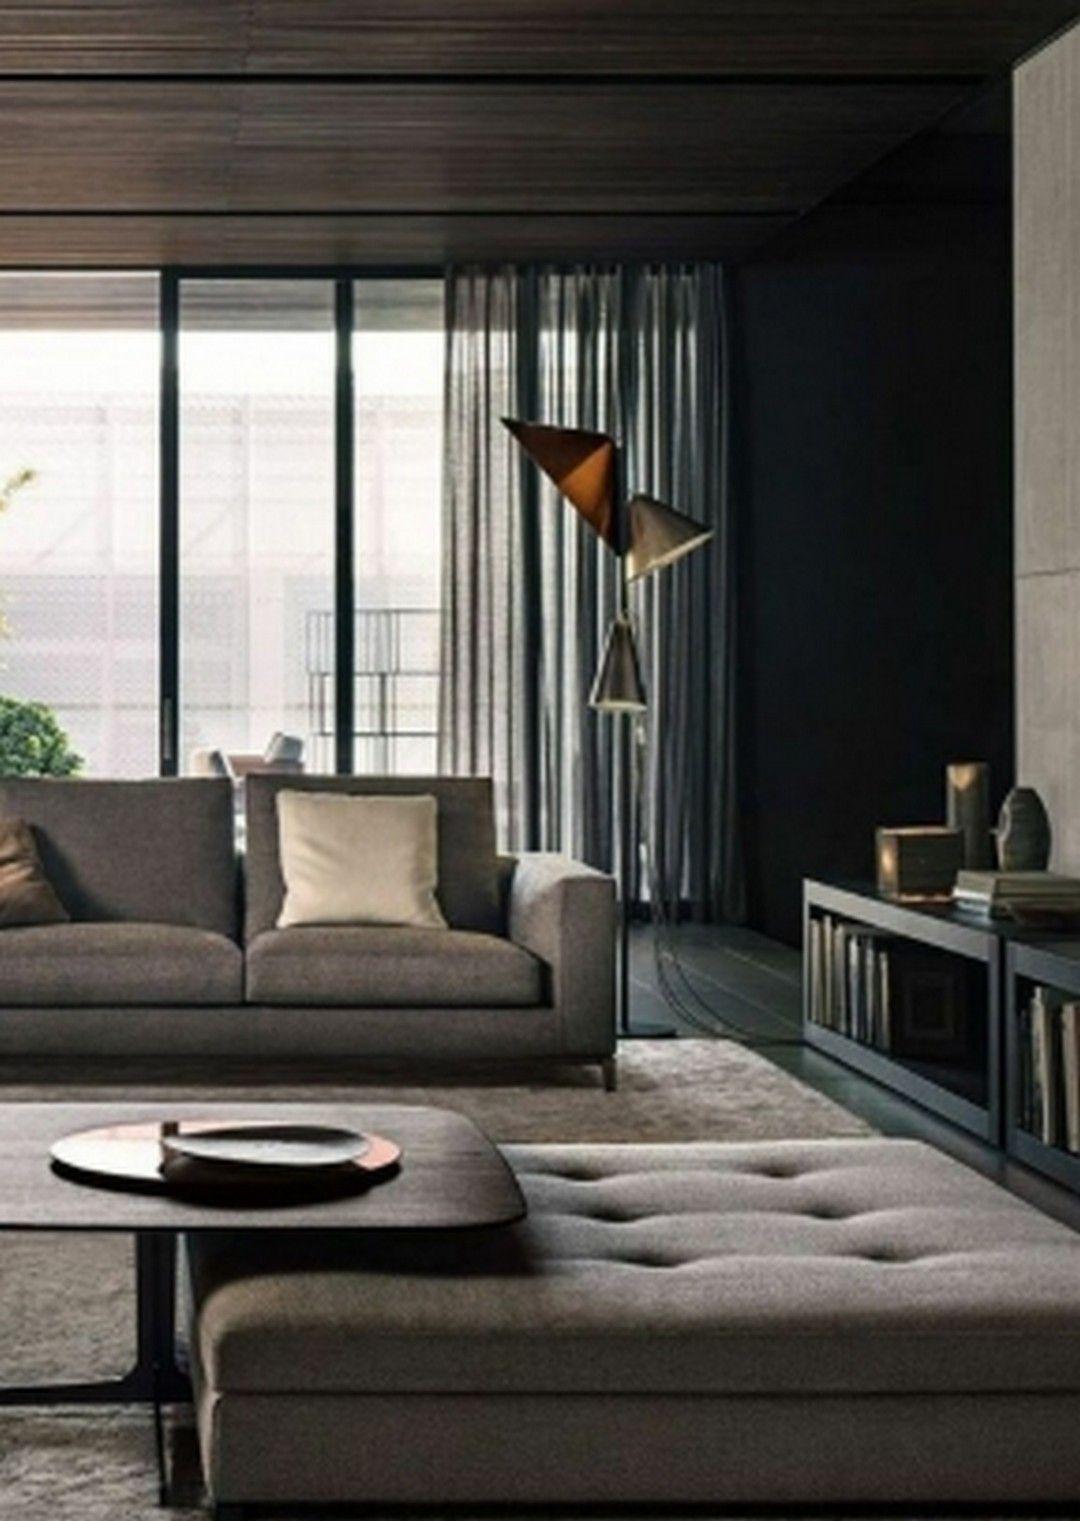 6 Minimalist Sofa Model Ideas For Modern Home Interiors in ...